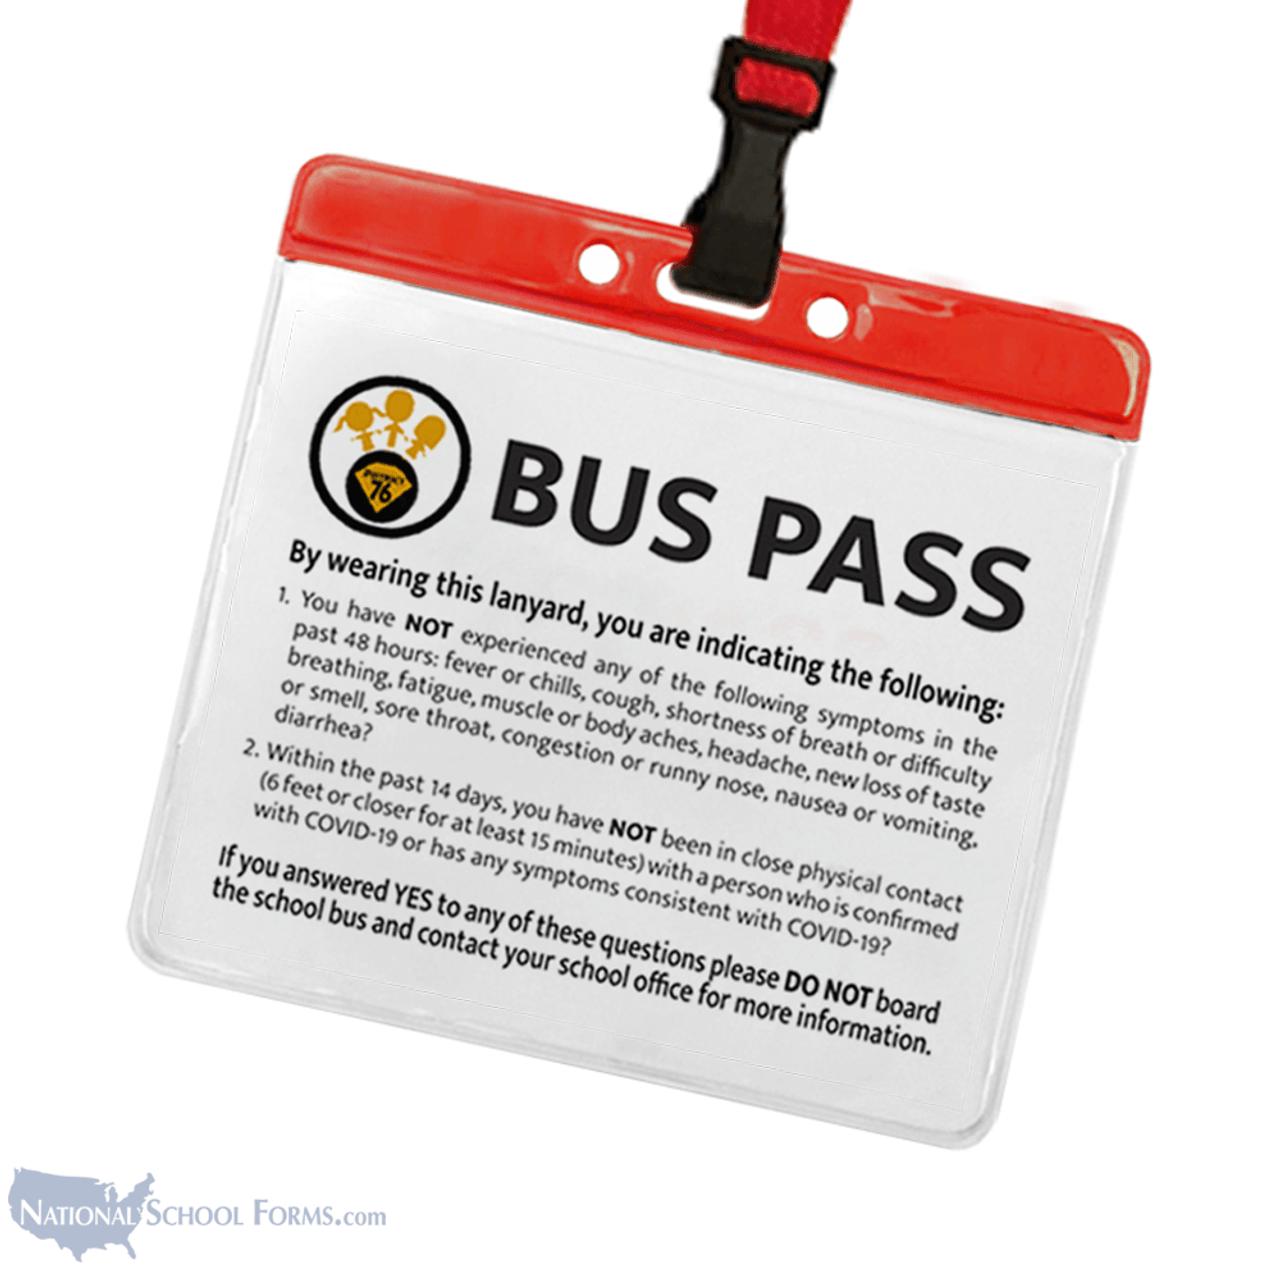 Covid Self-Certification Bus Pass on Breakaway Lanyard